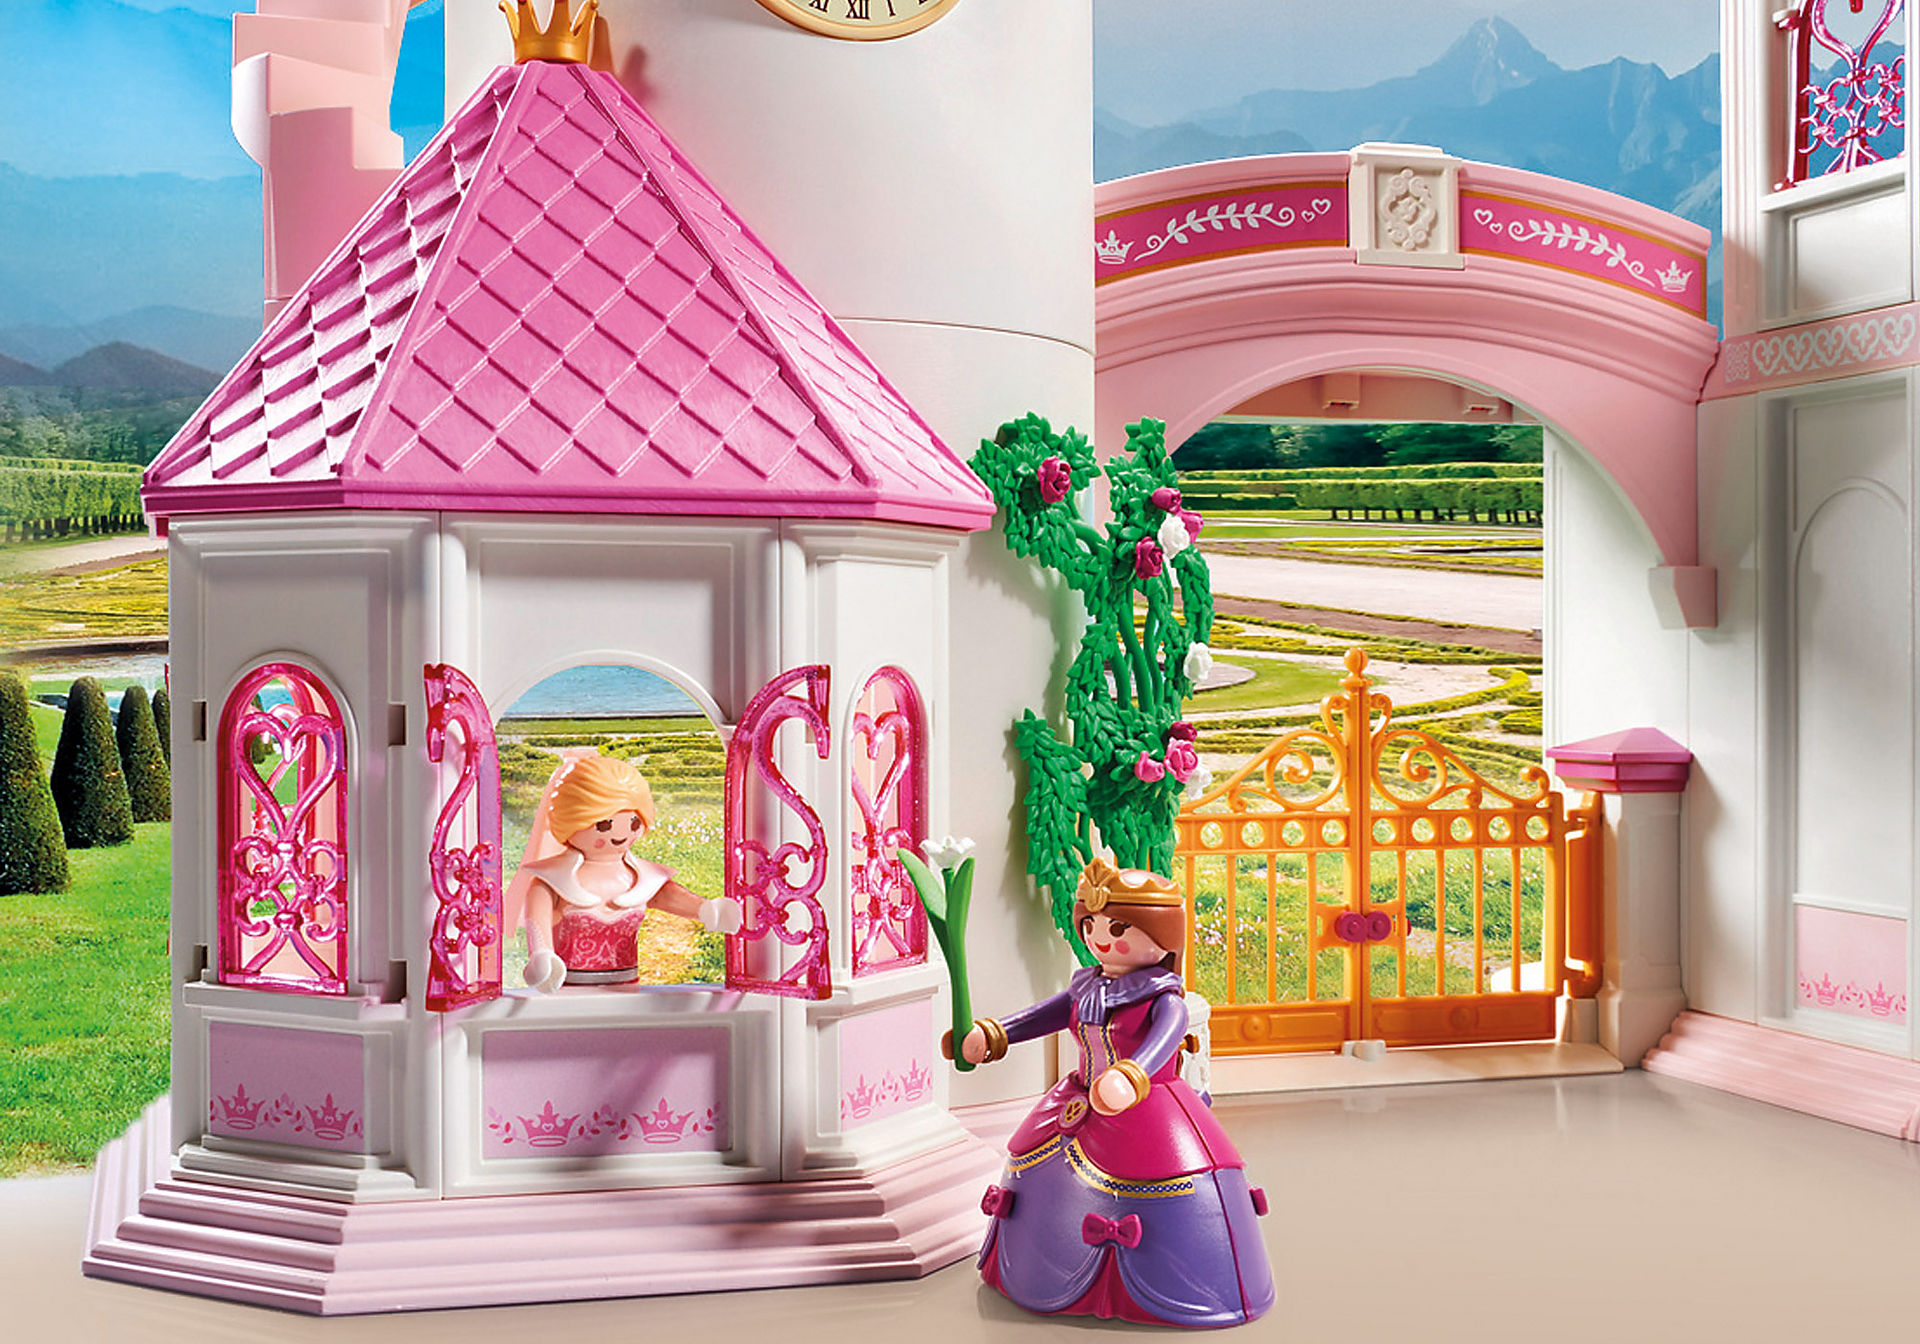 70447 Grande Castelo das Princesas zoom image4